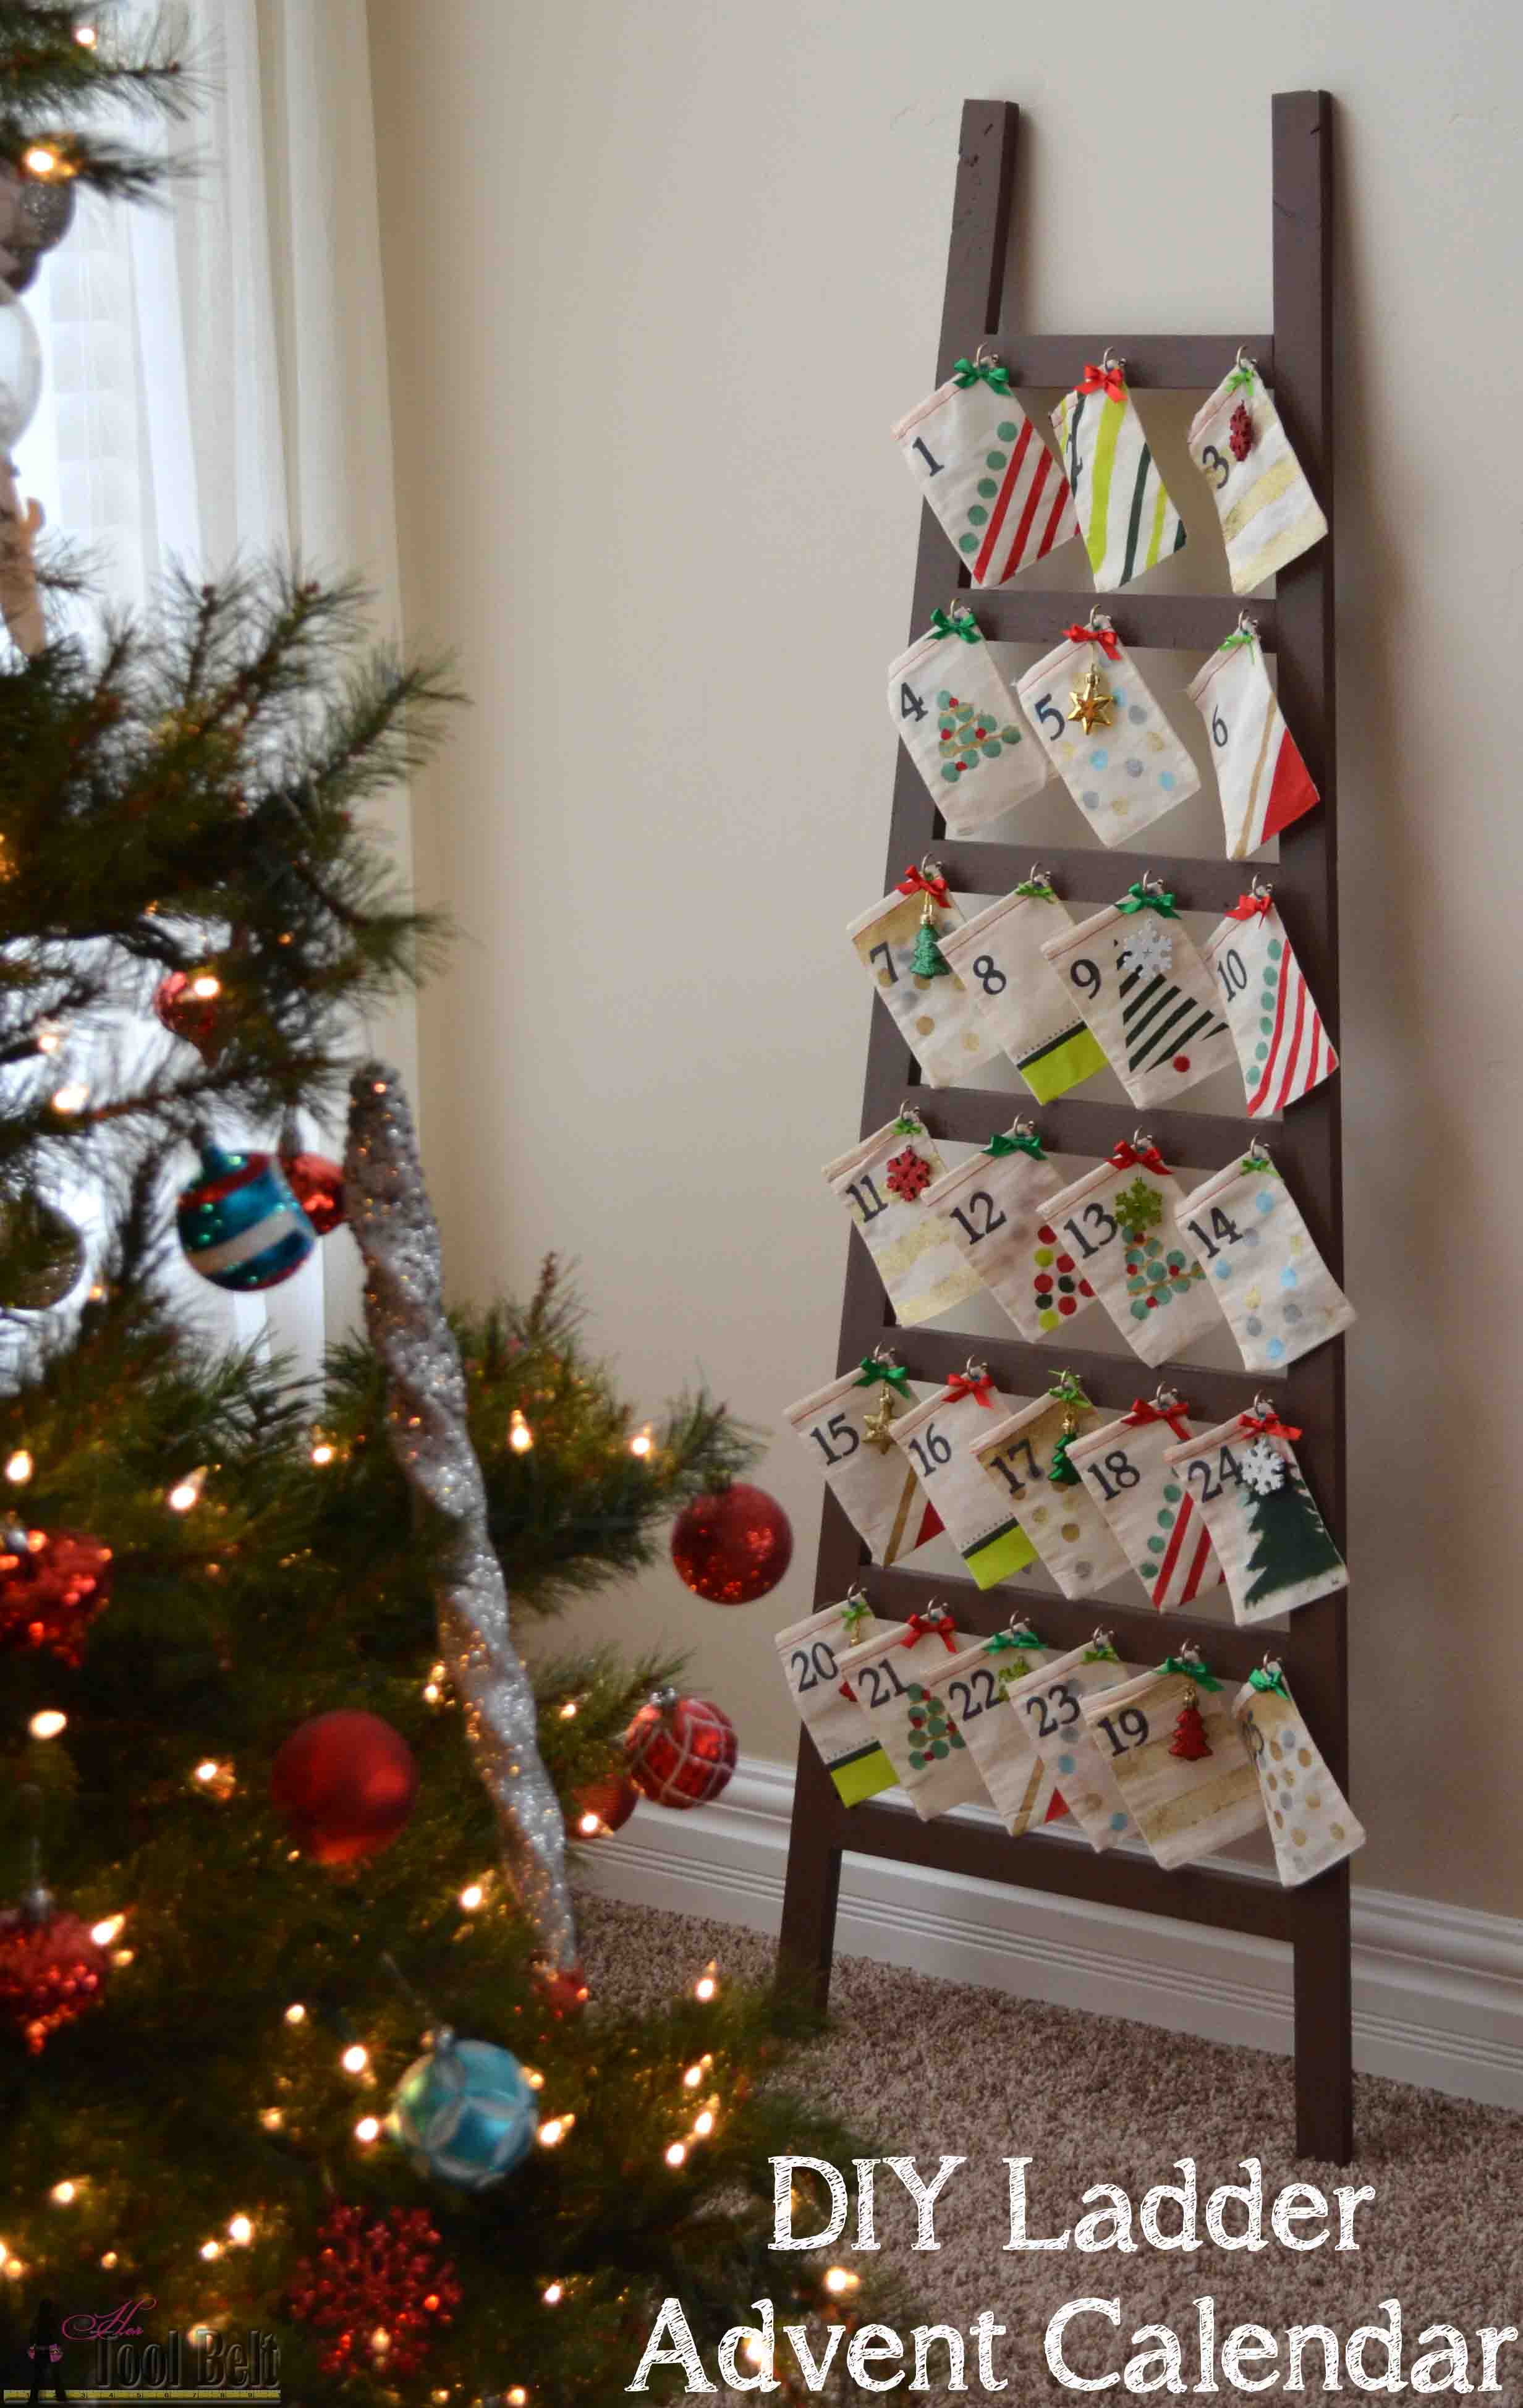 Best ideas about Advent Calendar DIY . Save or Pin Ladder Advent Calendar Her Tool Belt Now.